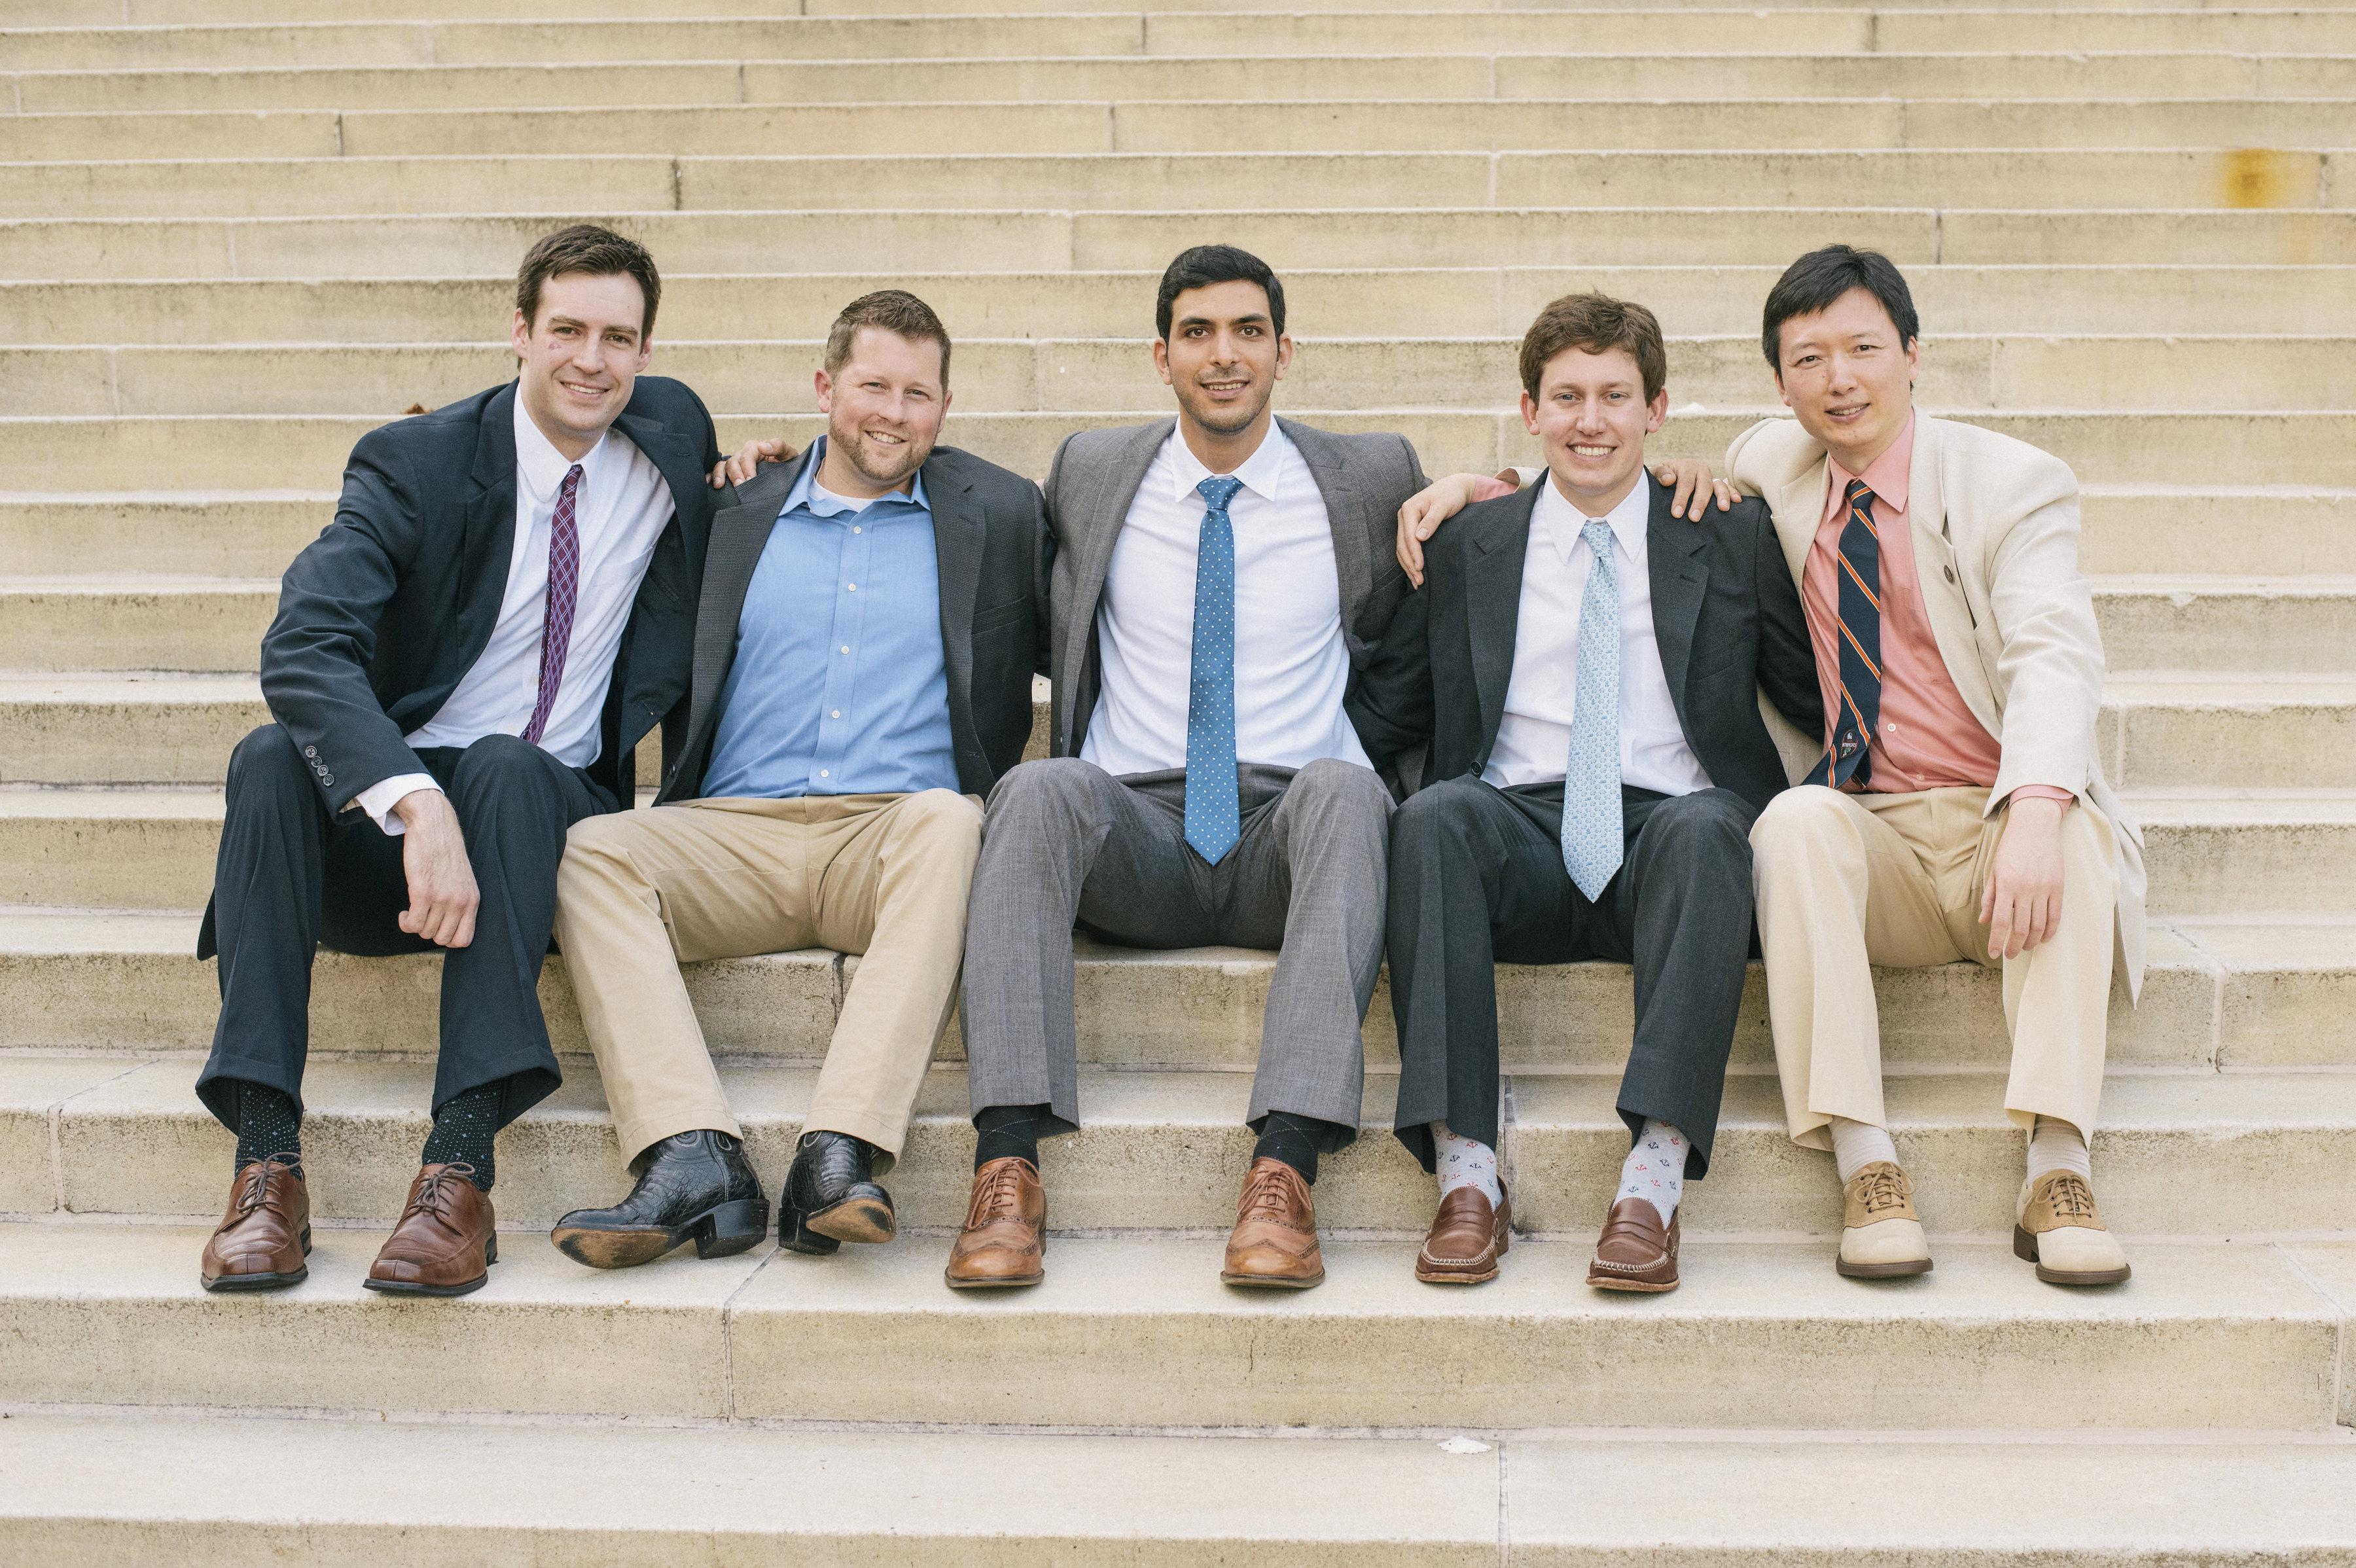 Chief residents 2015/16 - Nathan Lanham, Adam Wilson, Rahman Kandil, Tyrrell Burrus, and Josh Li